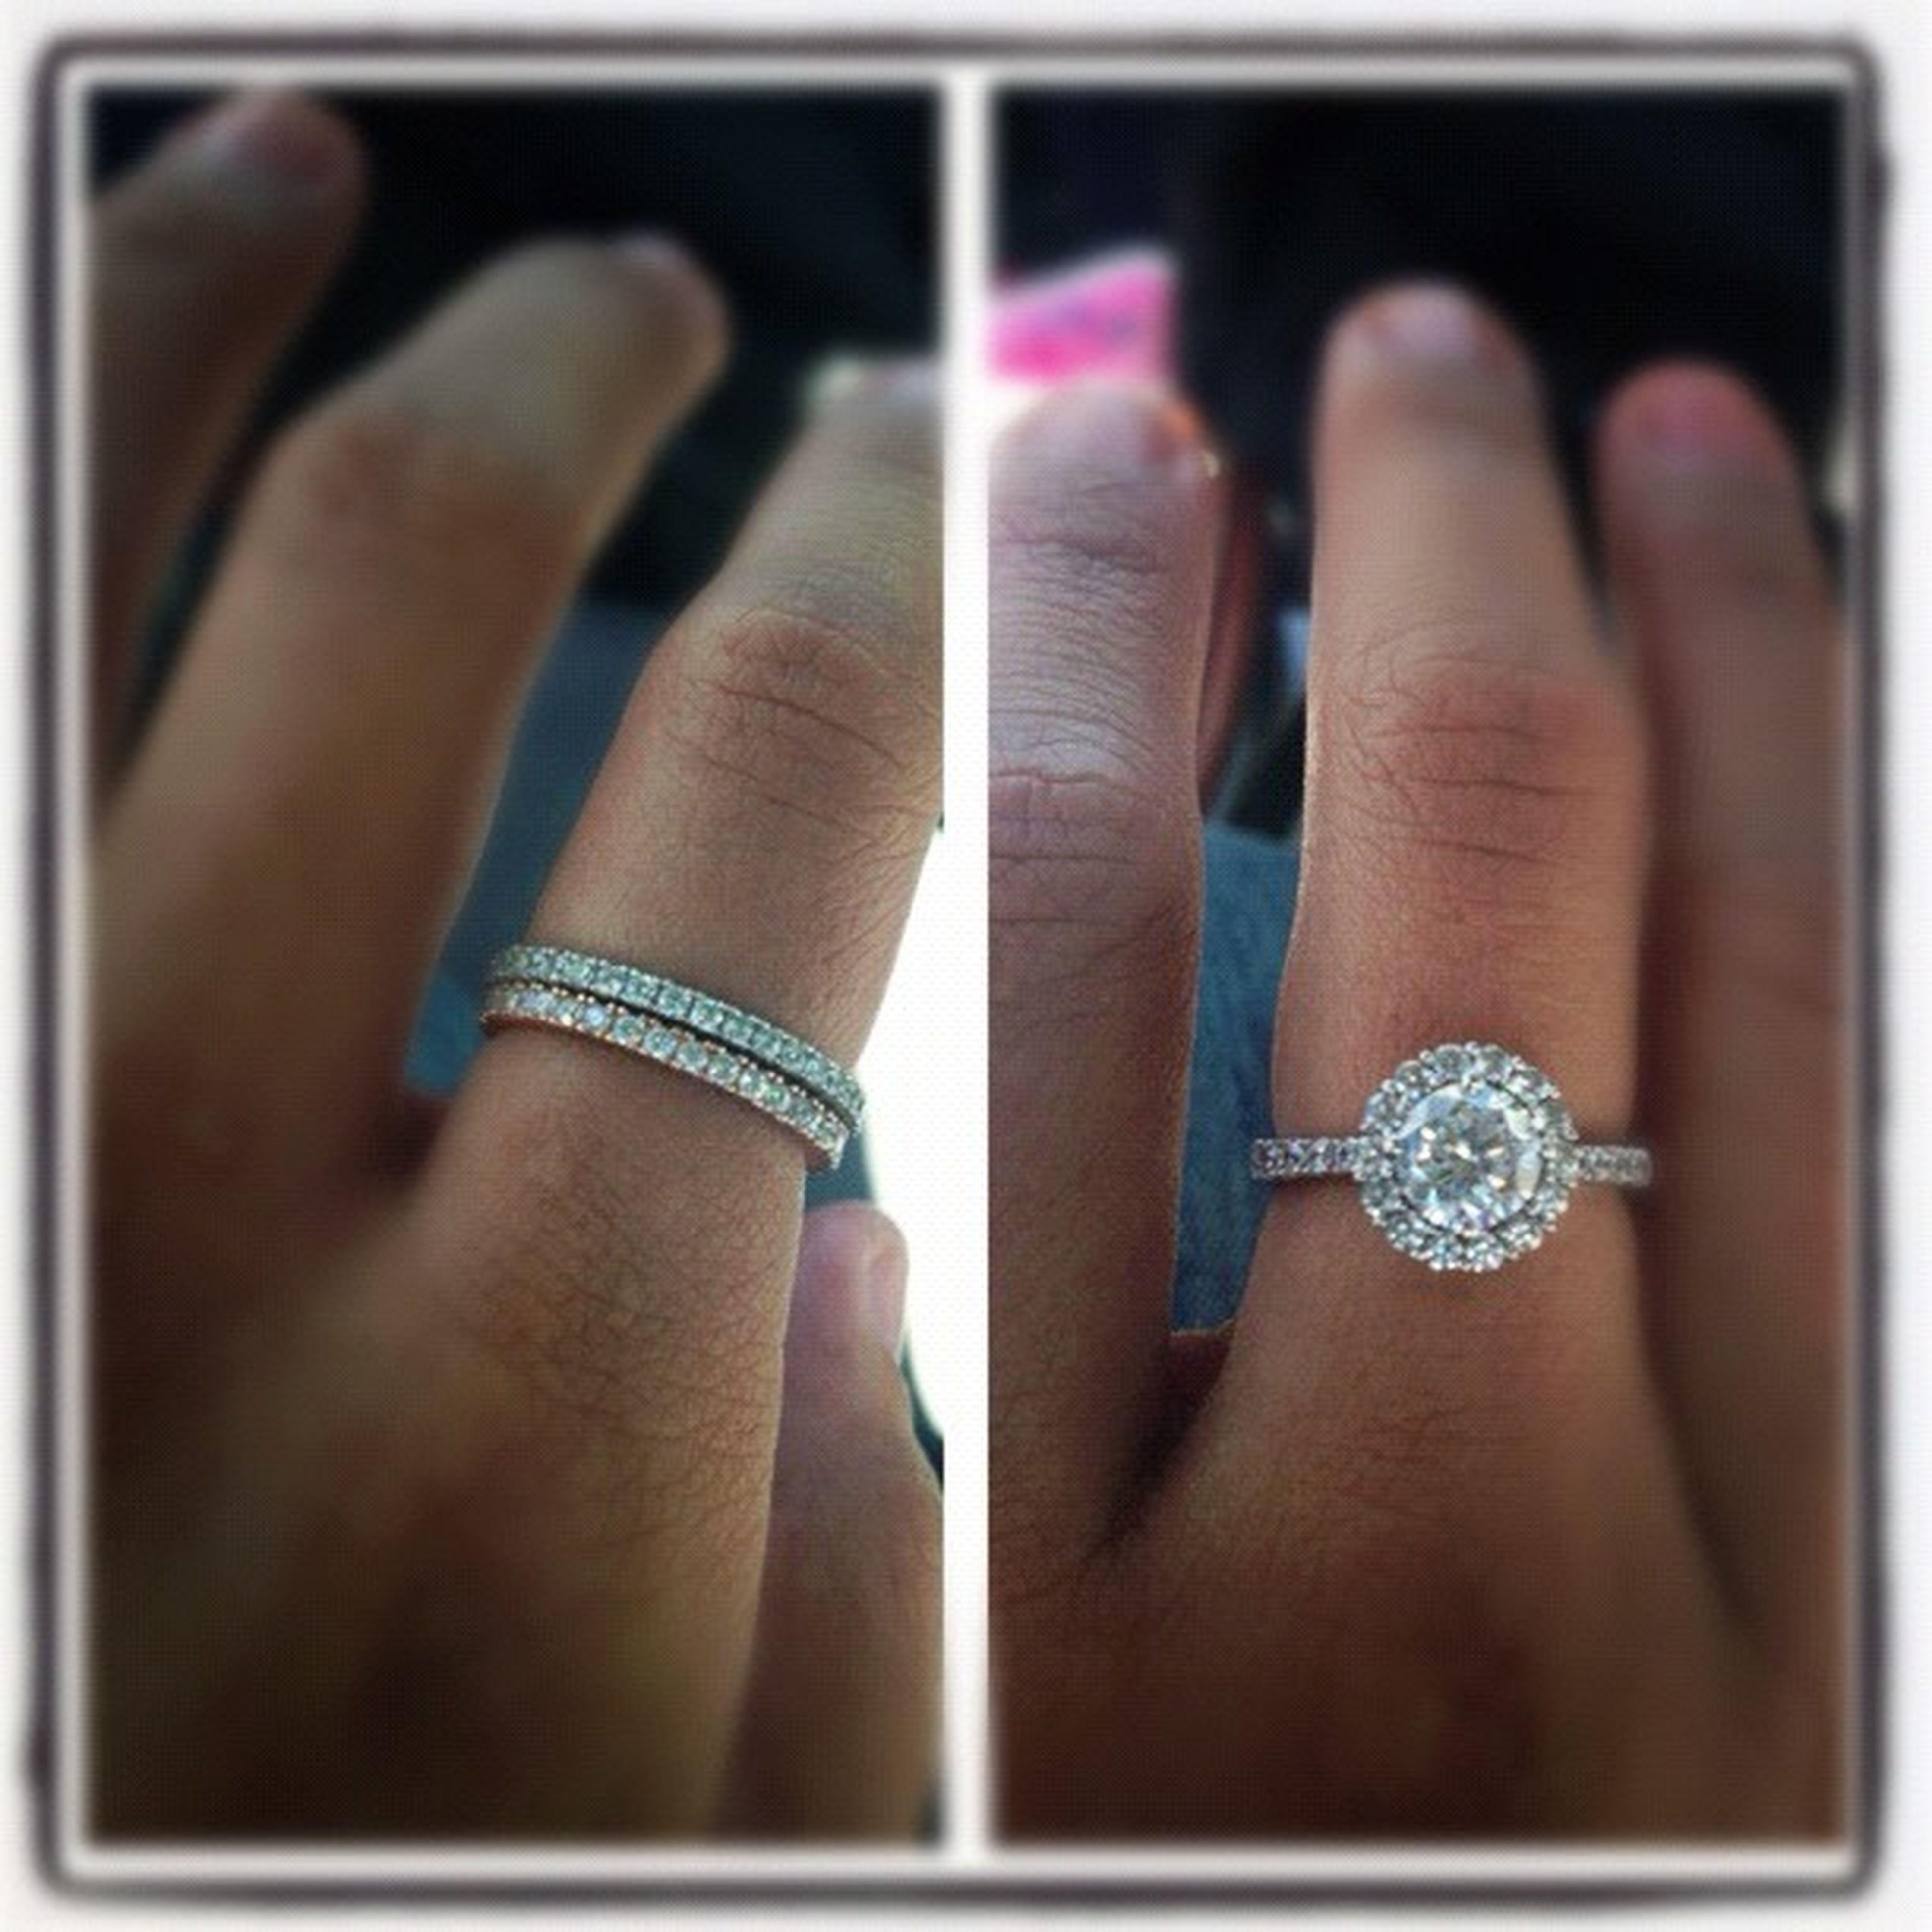 09.25.2012 L: :$25 cz ring R: $35 cz fashion ring Londonmanori @londonmanori I will visit u soon!! 😊